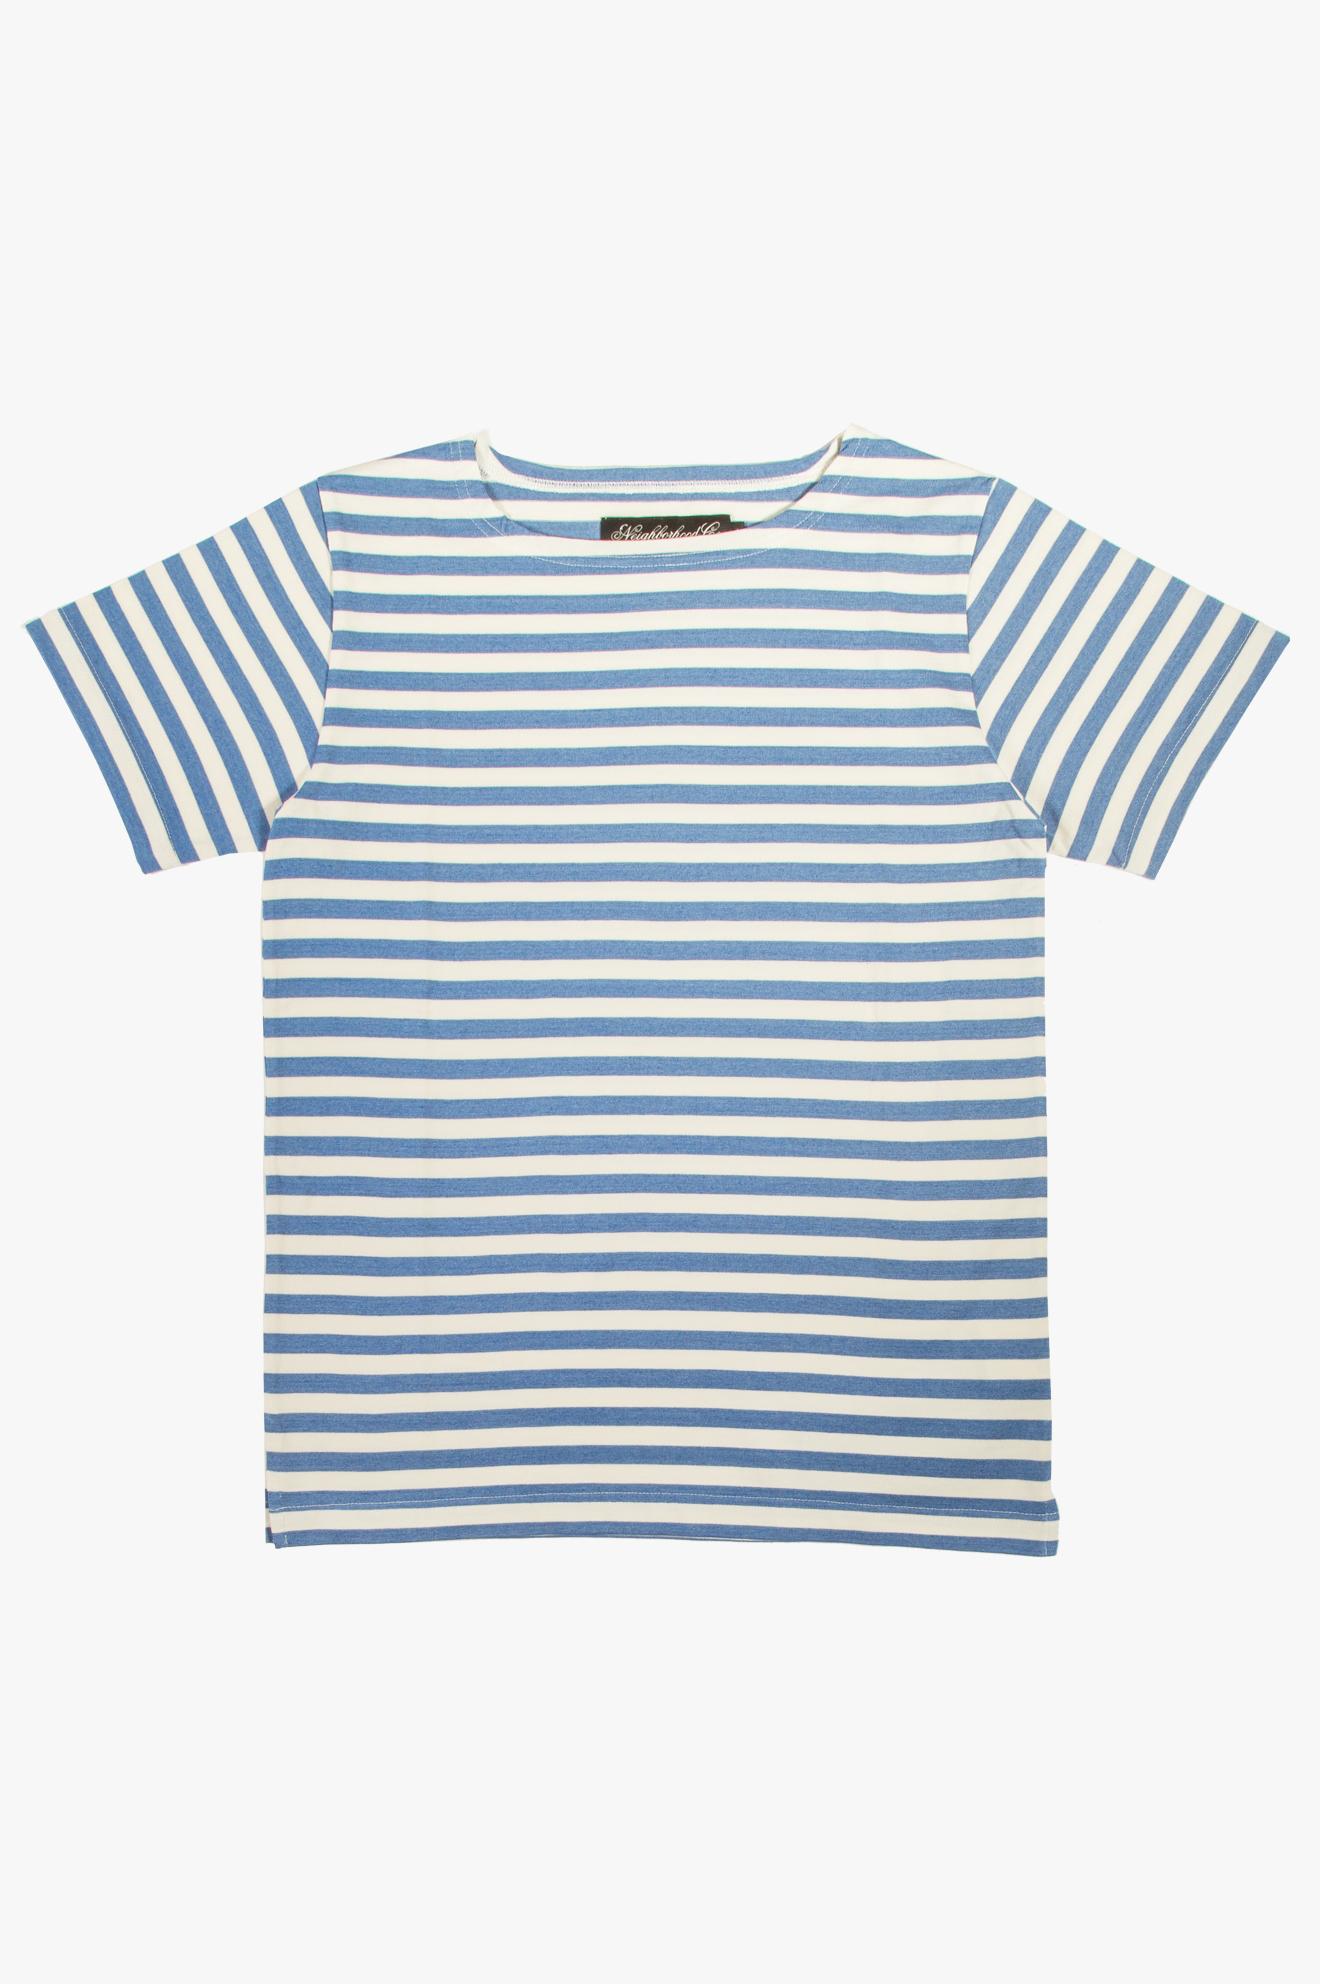 Pablo T-Shirt White/Blue Stripes